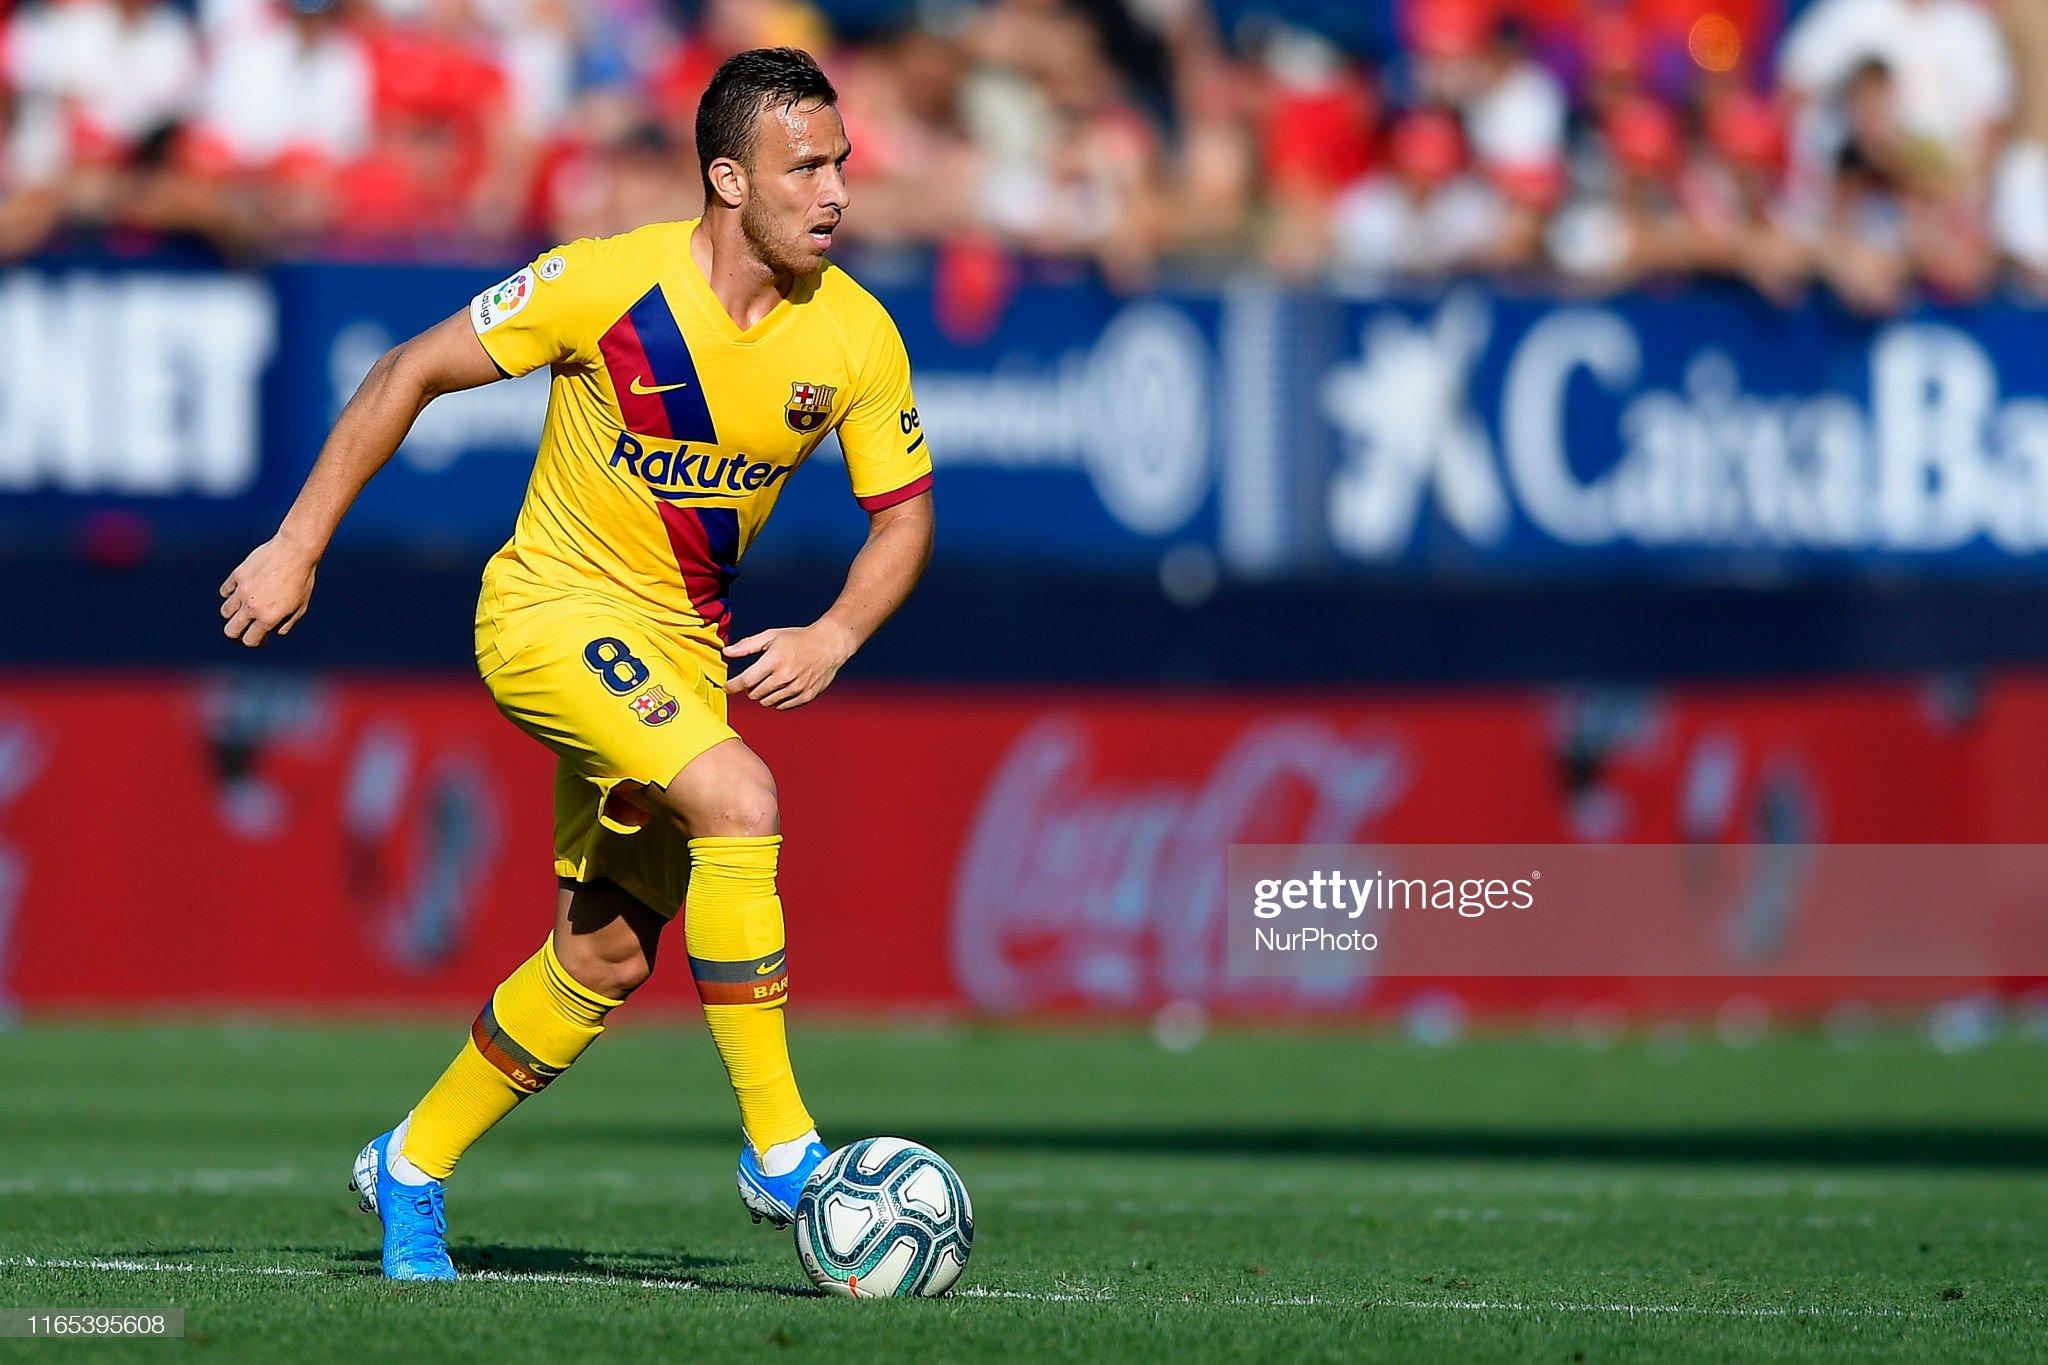 صور مباراة : أوساسونا - برشلونة 2-2 ( 31-08-2019 )  Arthur-melo-of-barcelona-controls-the-ball-during-the-liga-match-ca-picture-id1165395608?s=2048x2048